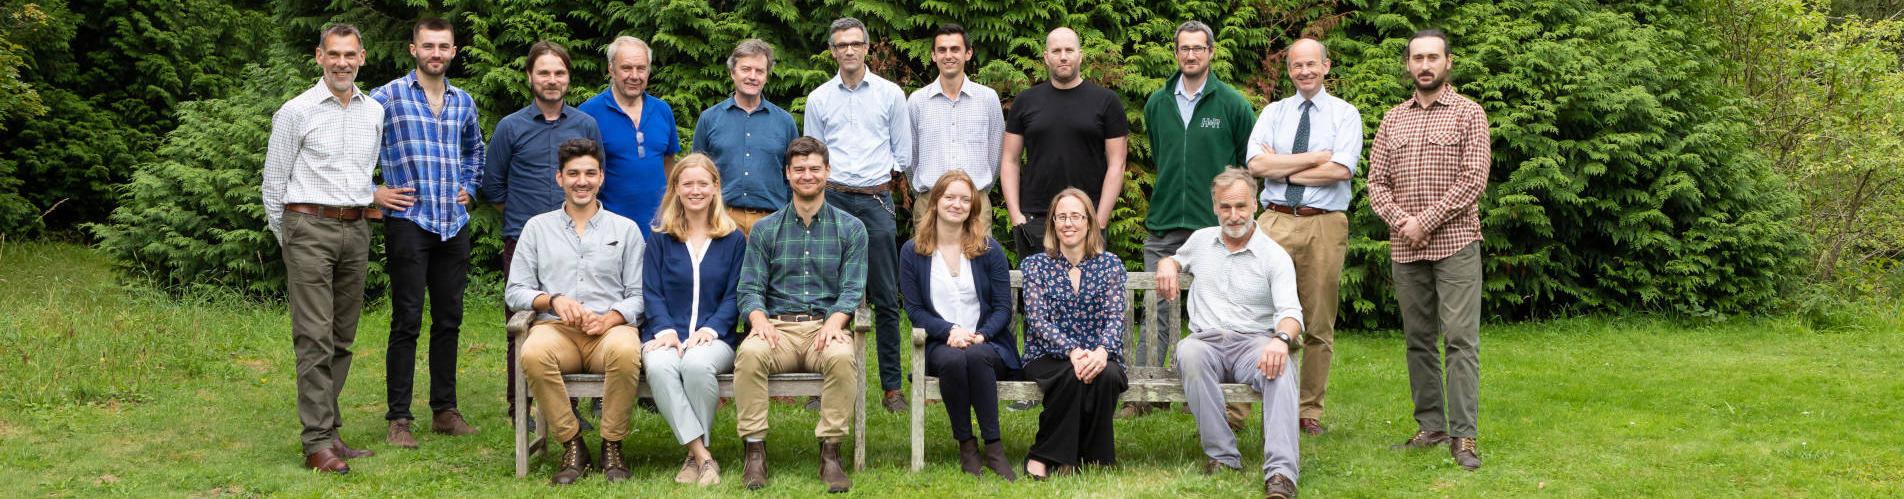 All surveyors - new group photo